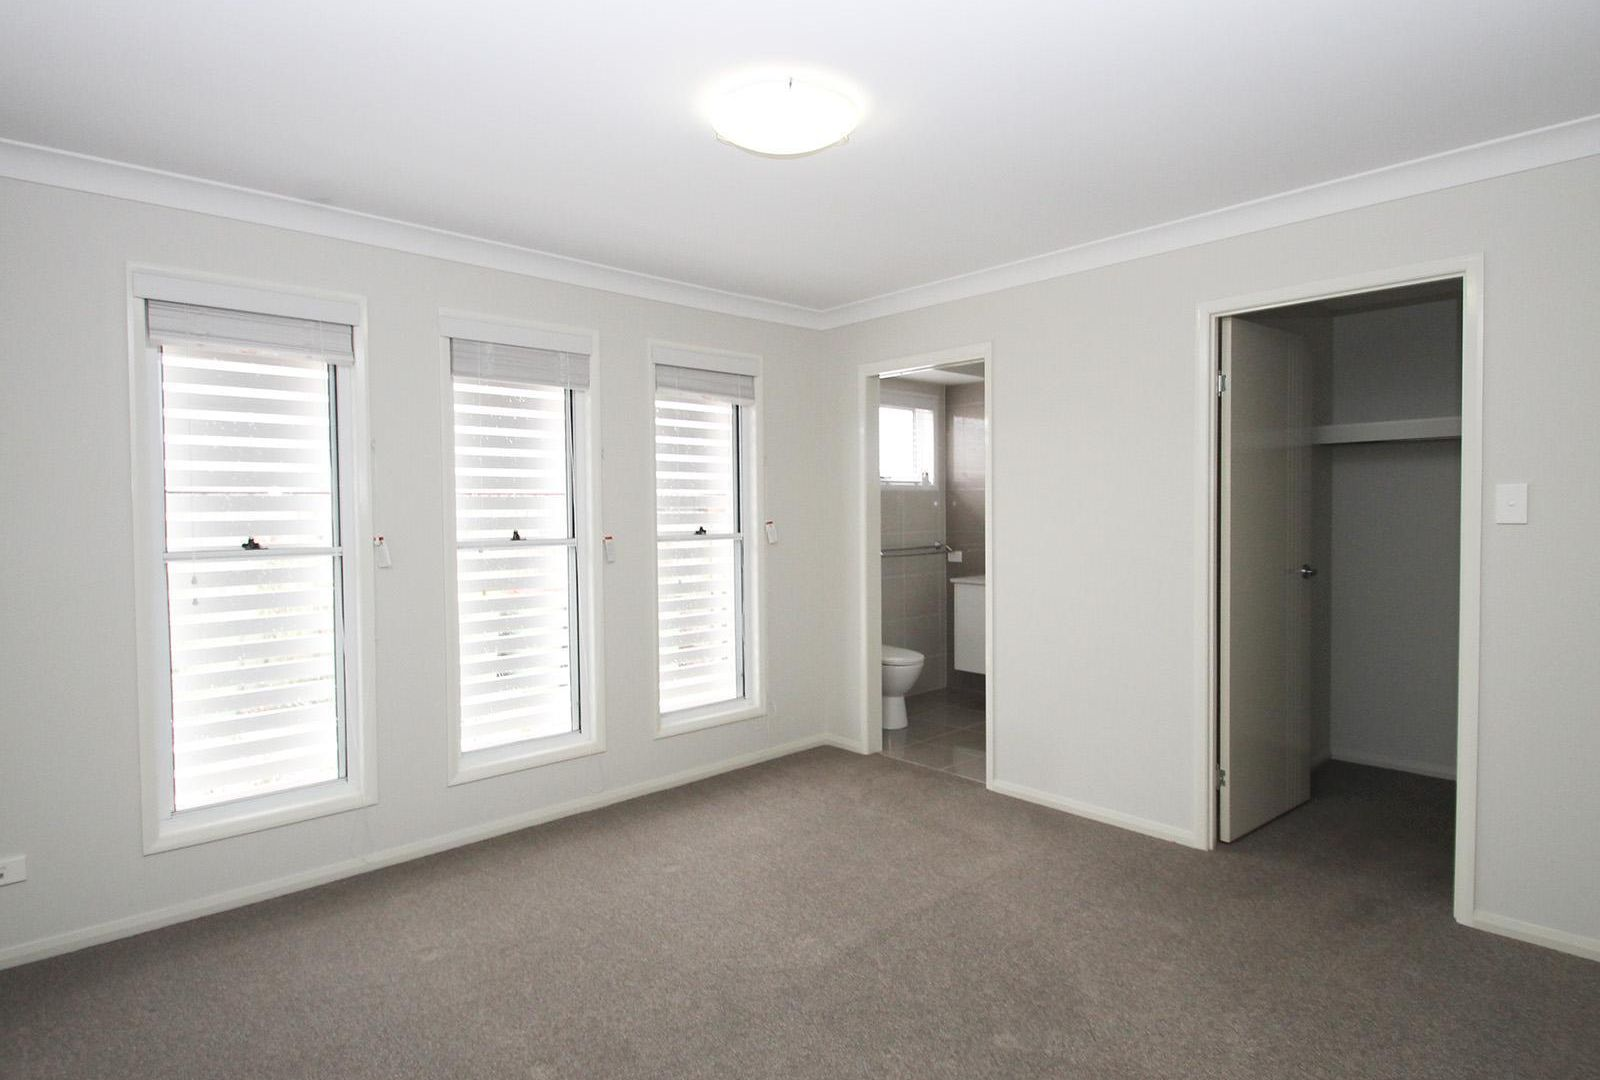 3/12 Horton Street Street, East Toowoomba QLD 4350, Image 2